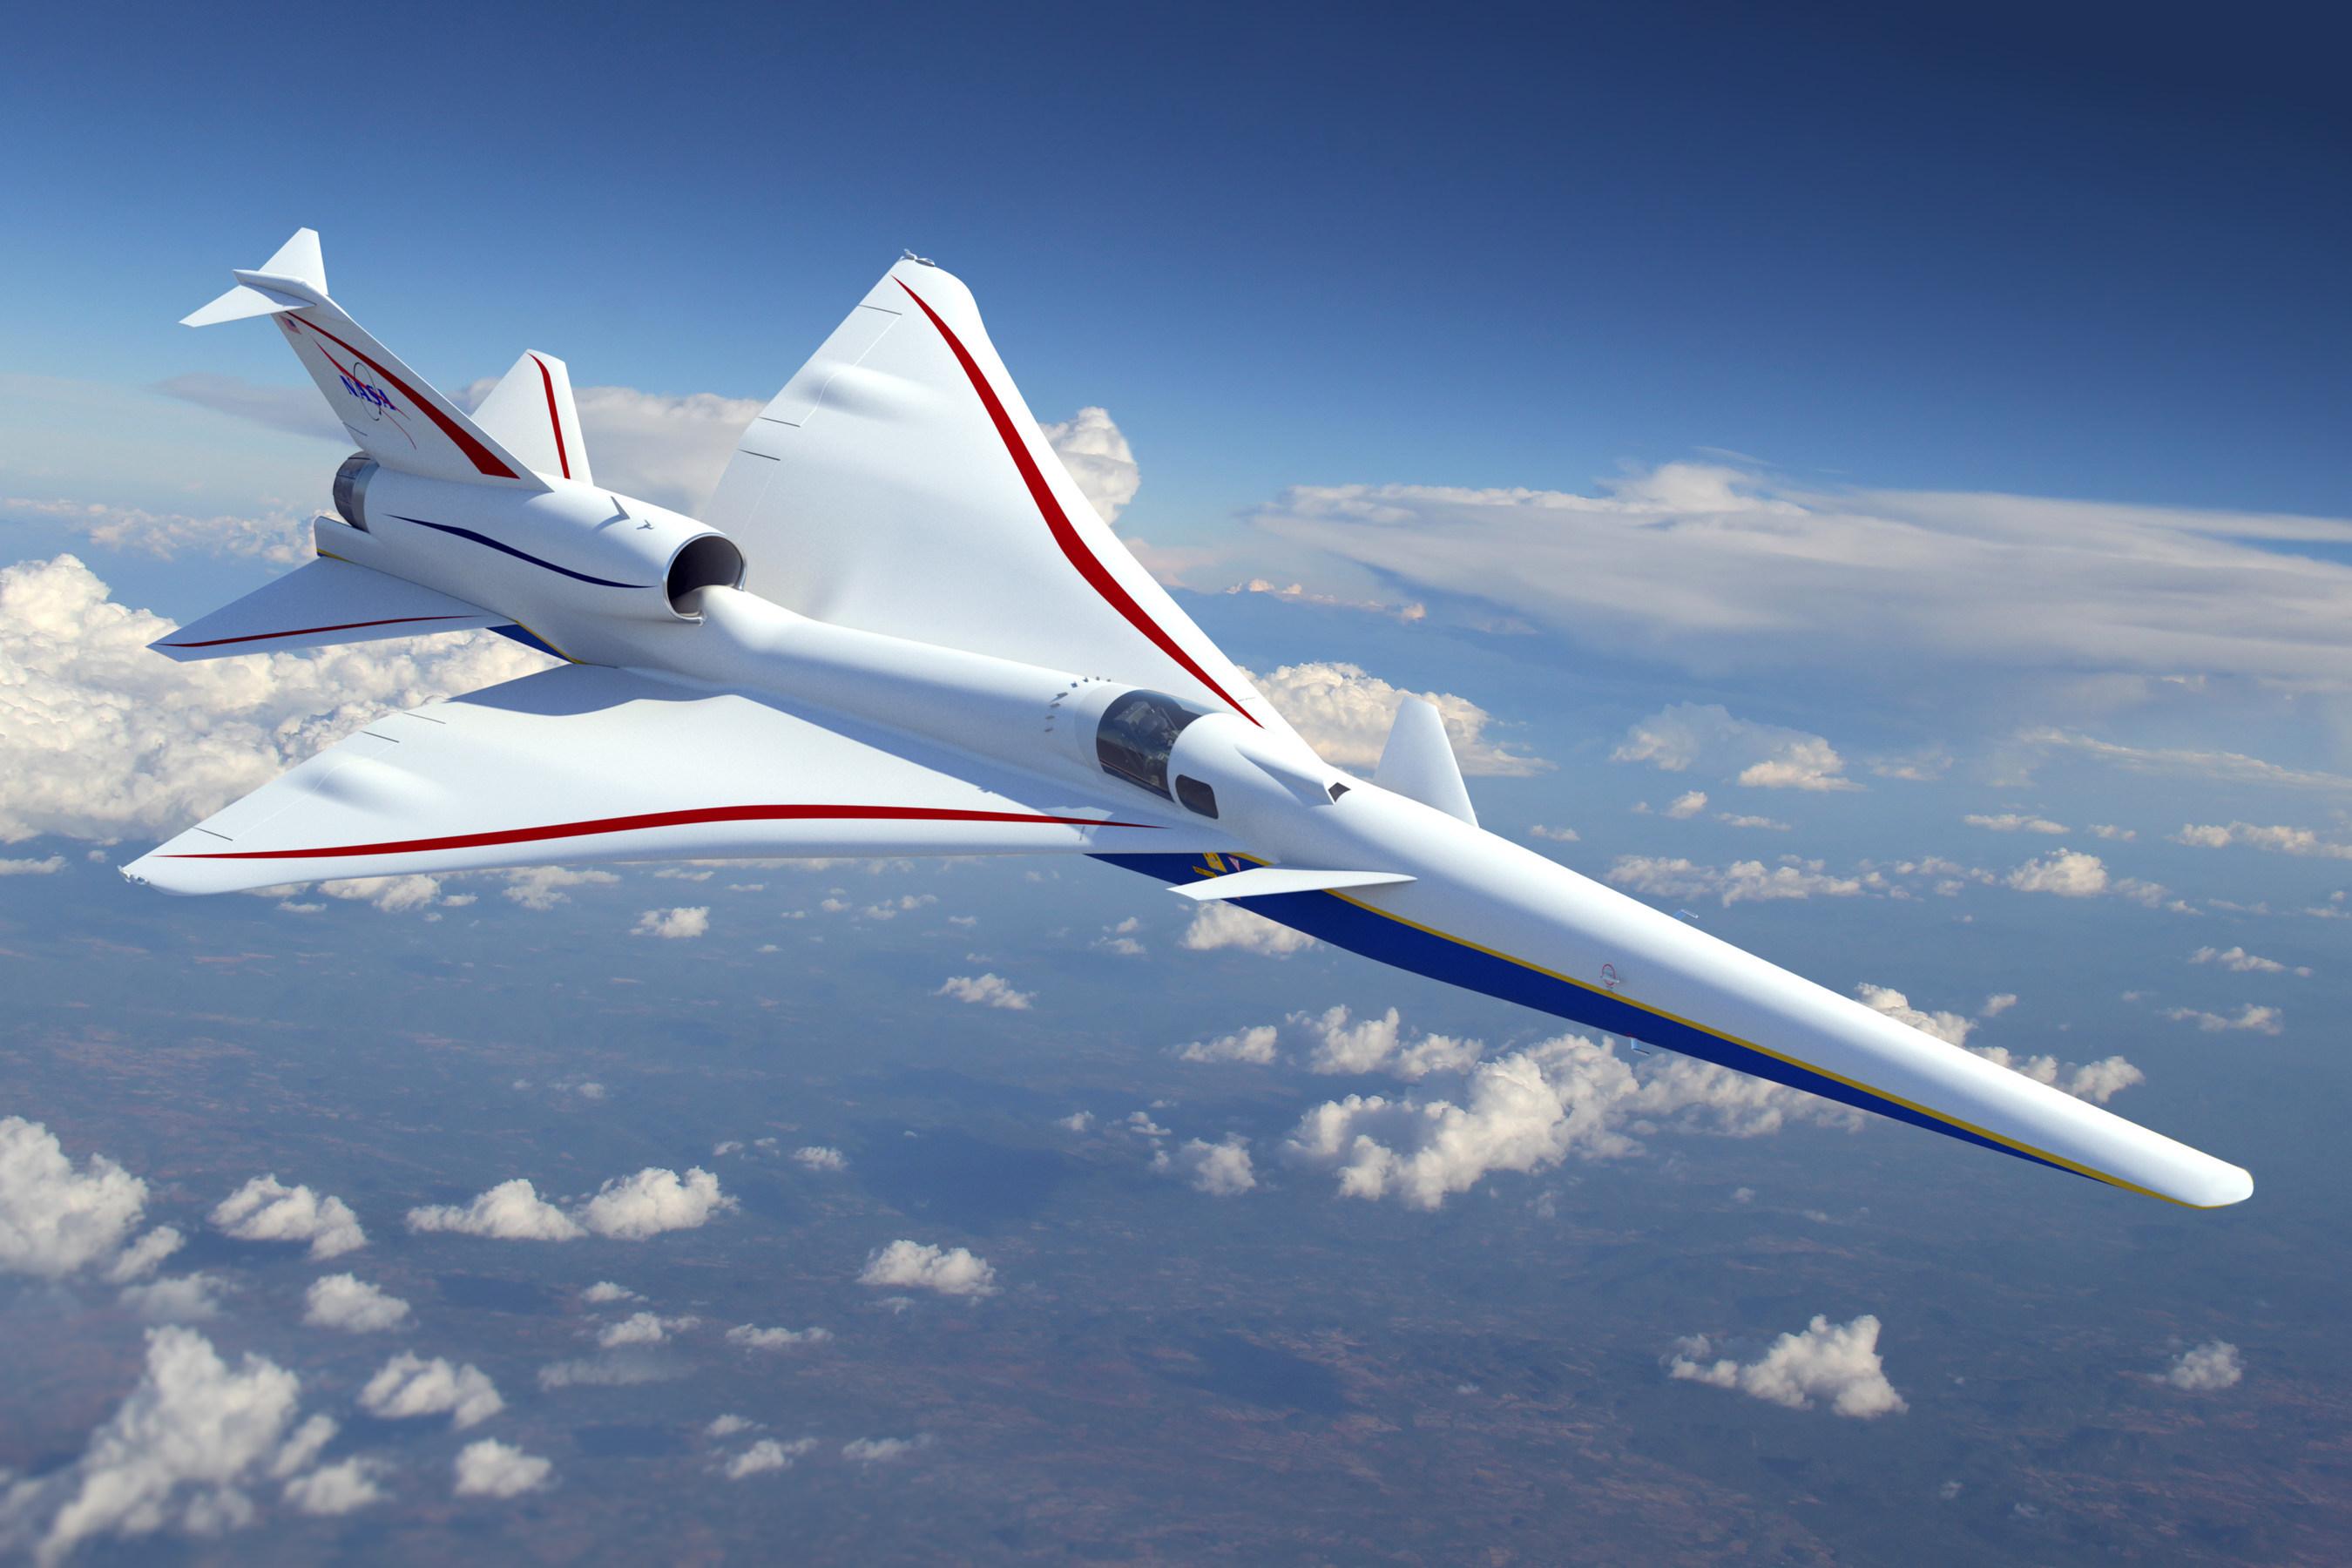 Lockheed Martin Skunk Works X-Plane